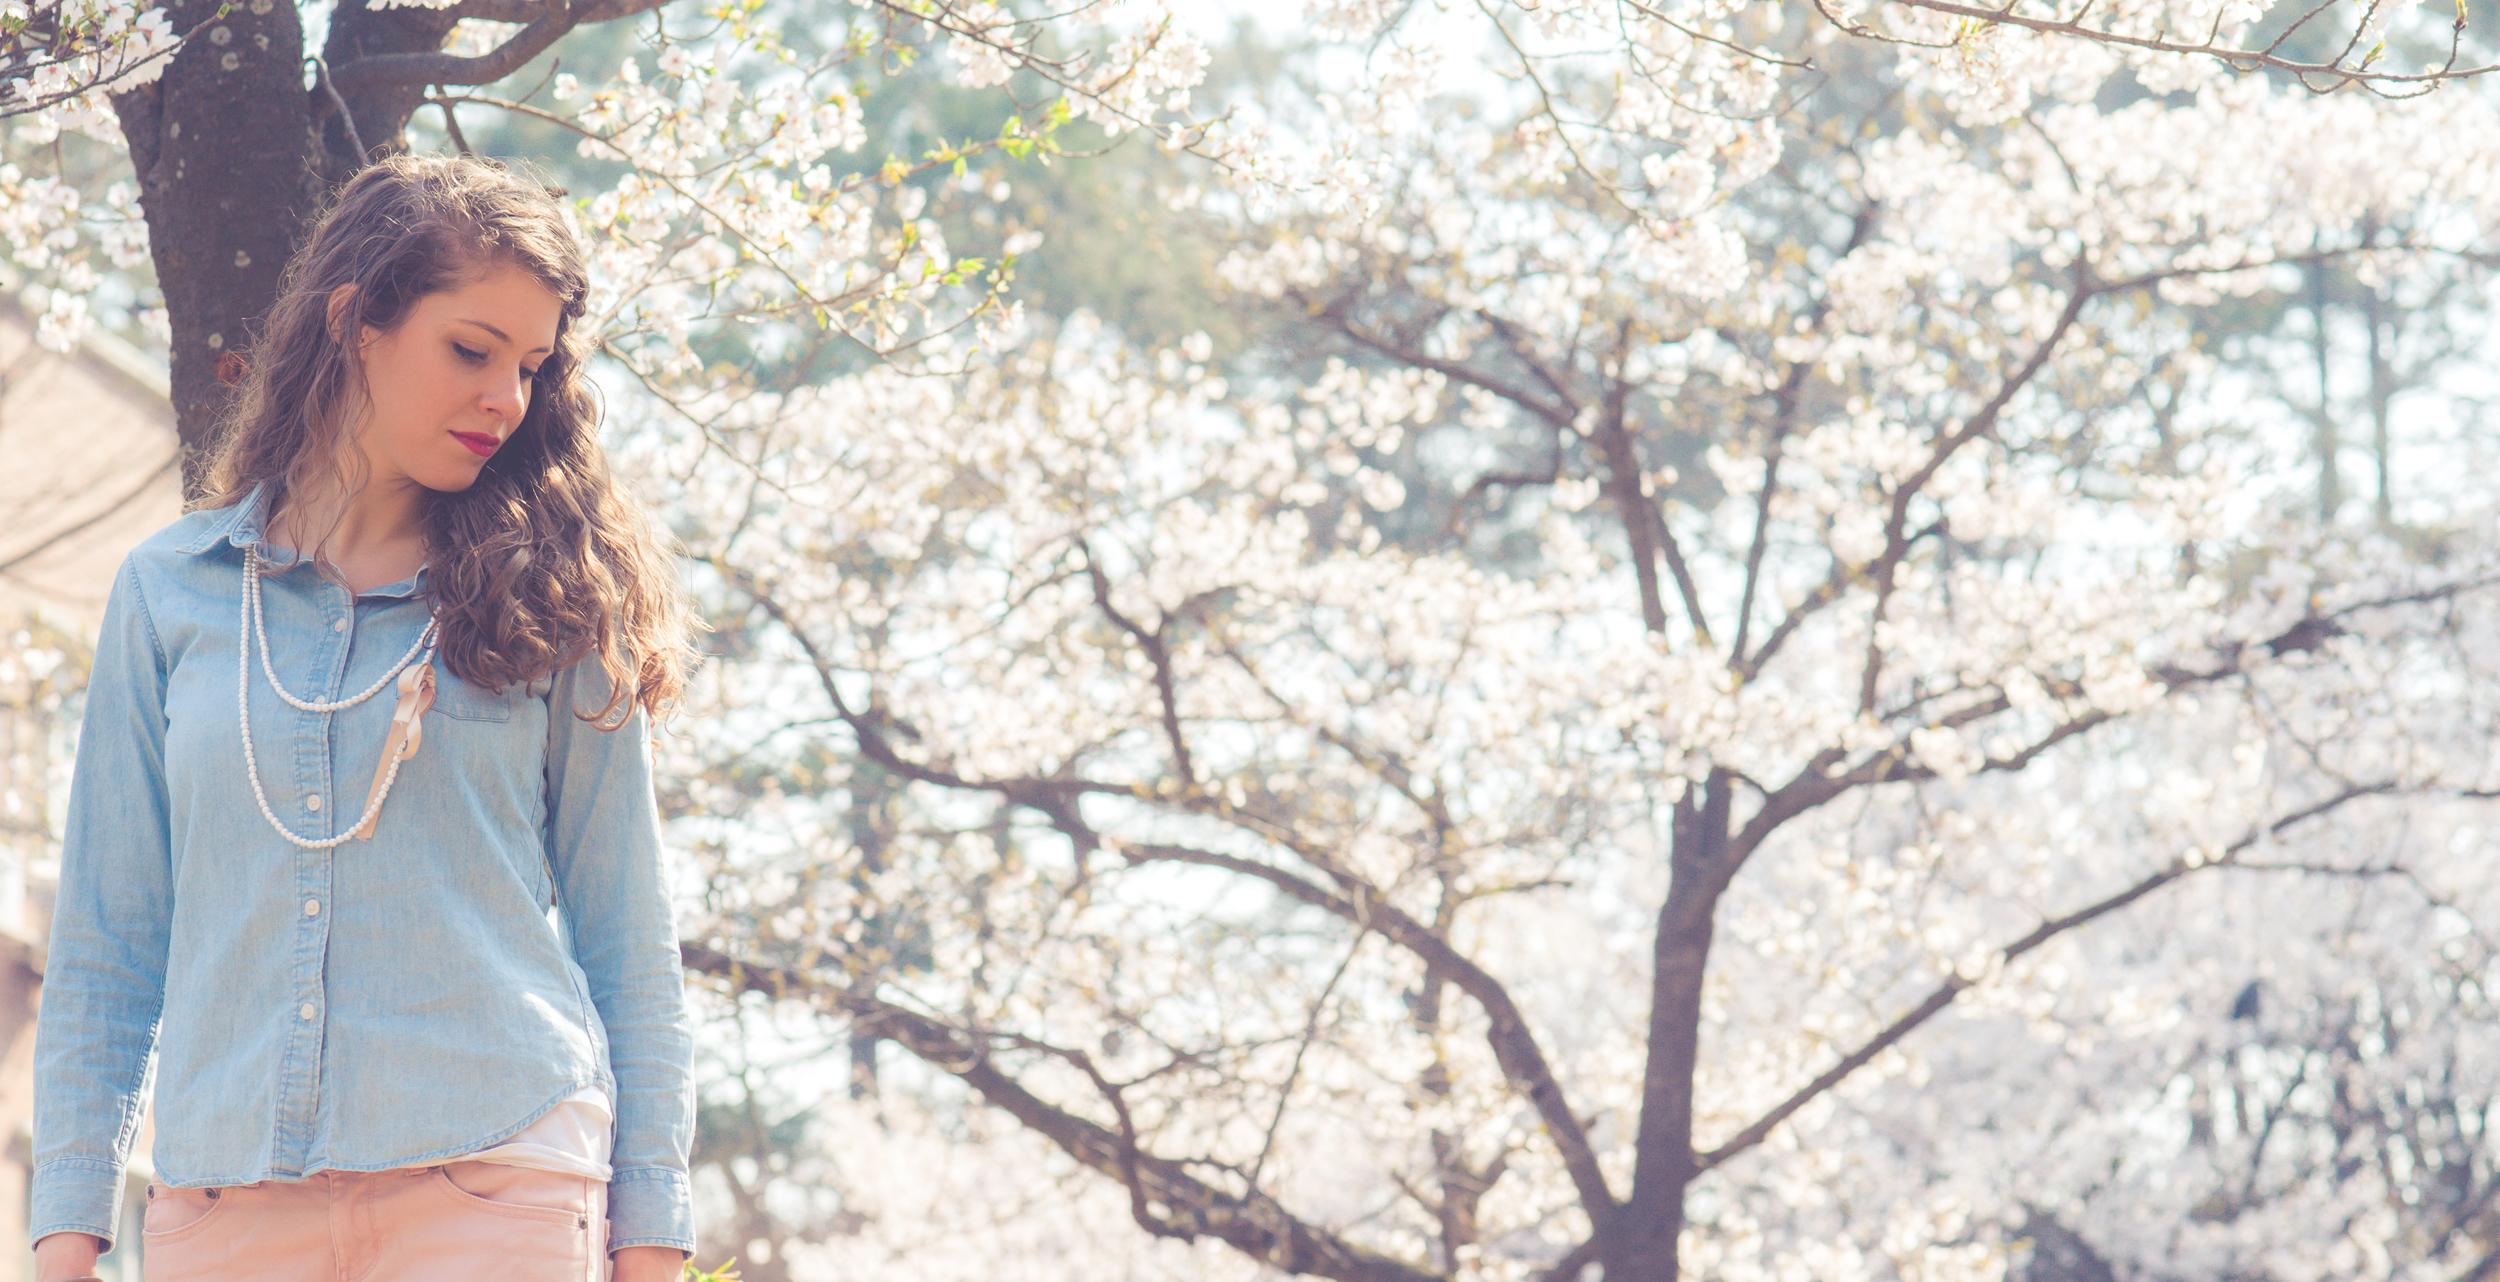 CherryBlossomStyledShootKoreaAlyshaCGSPhotography (25 of 57).jpg